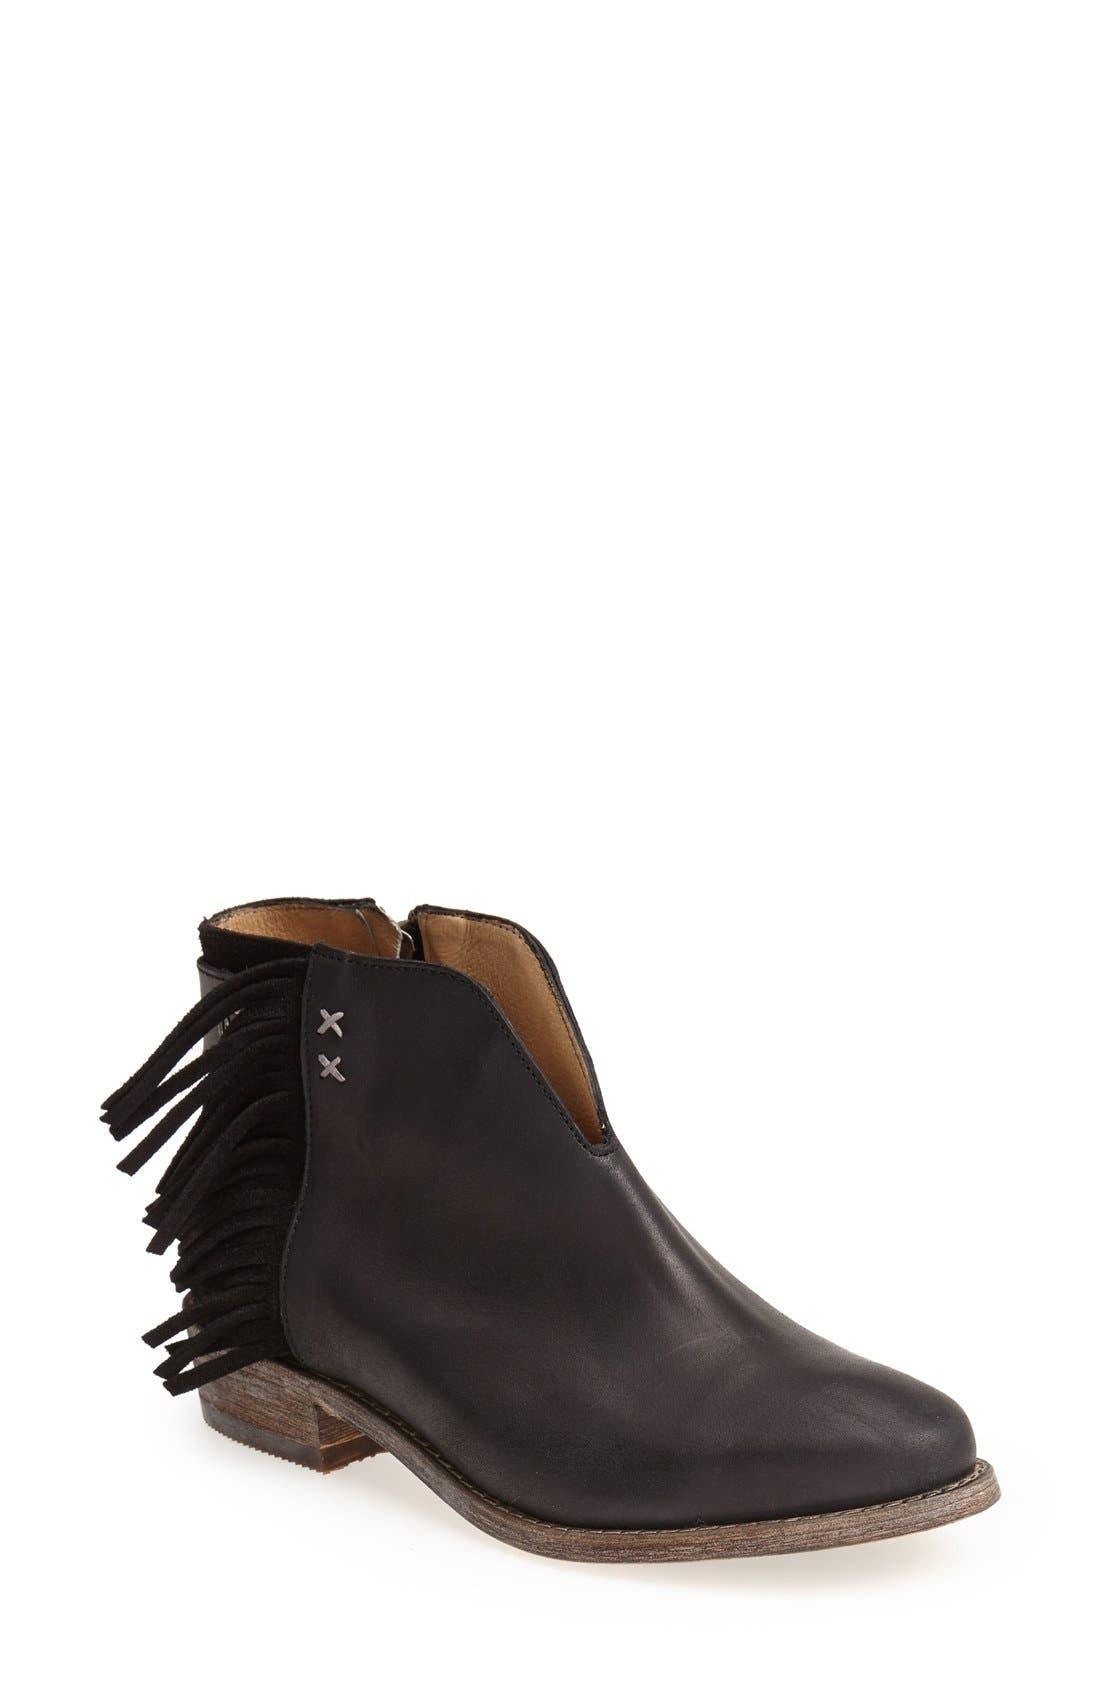 Alternate Image 1 Selected - Koolaburra 'Dallas' Fringed Leather Bootie (Women)